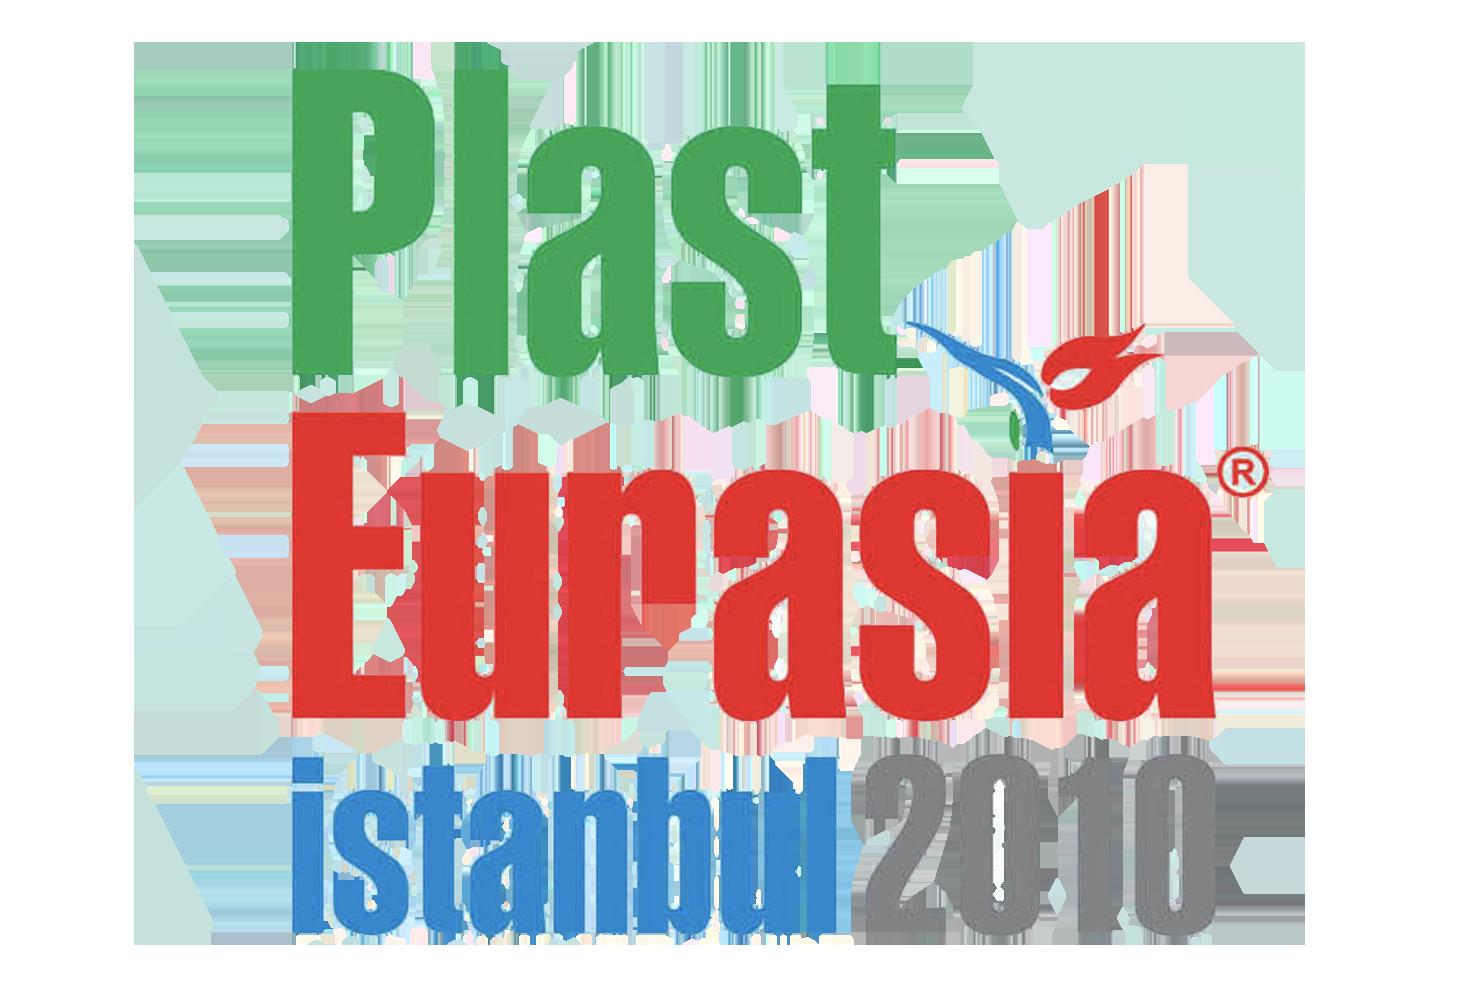 PLASTEURASIA 2010